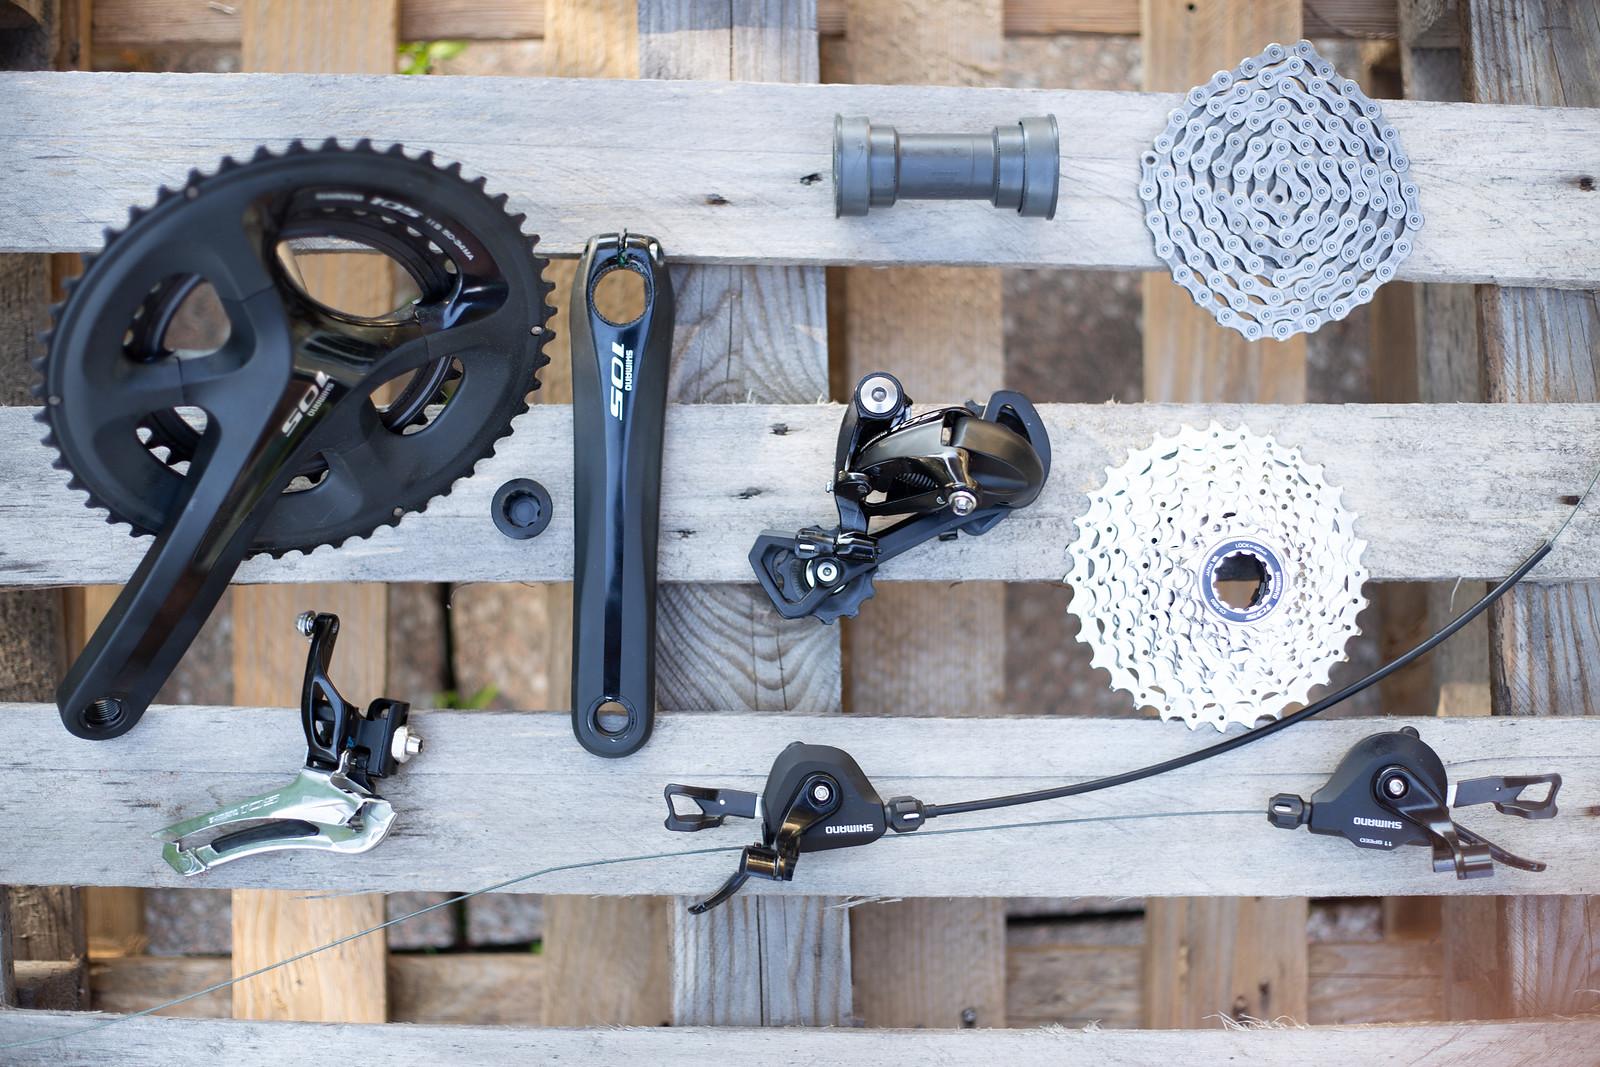 Shimano 105 5800 Rennrad-/Crossschaltgruppe | Bikemarkt.MTB-News.de